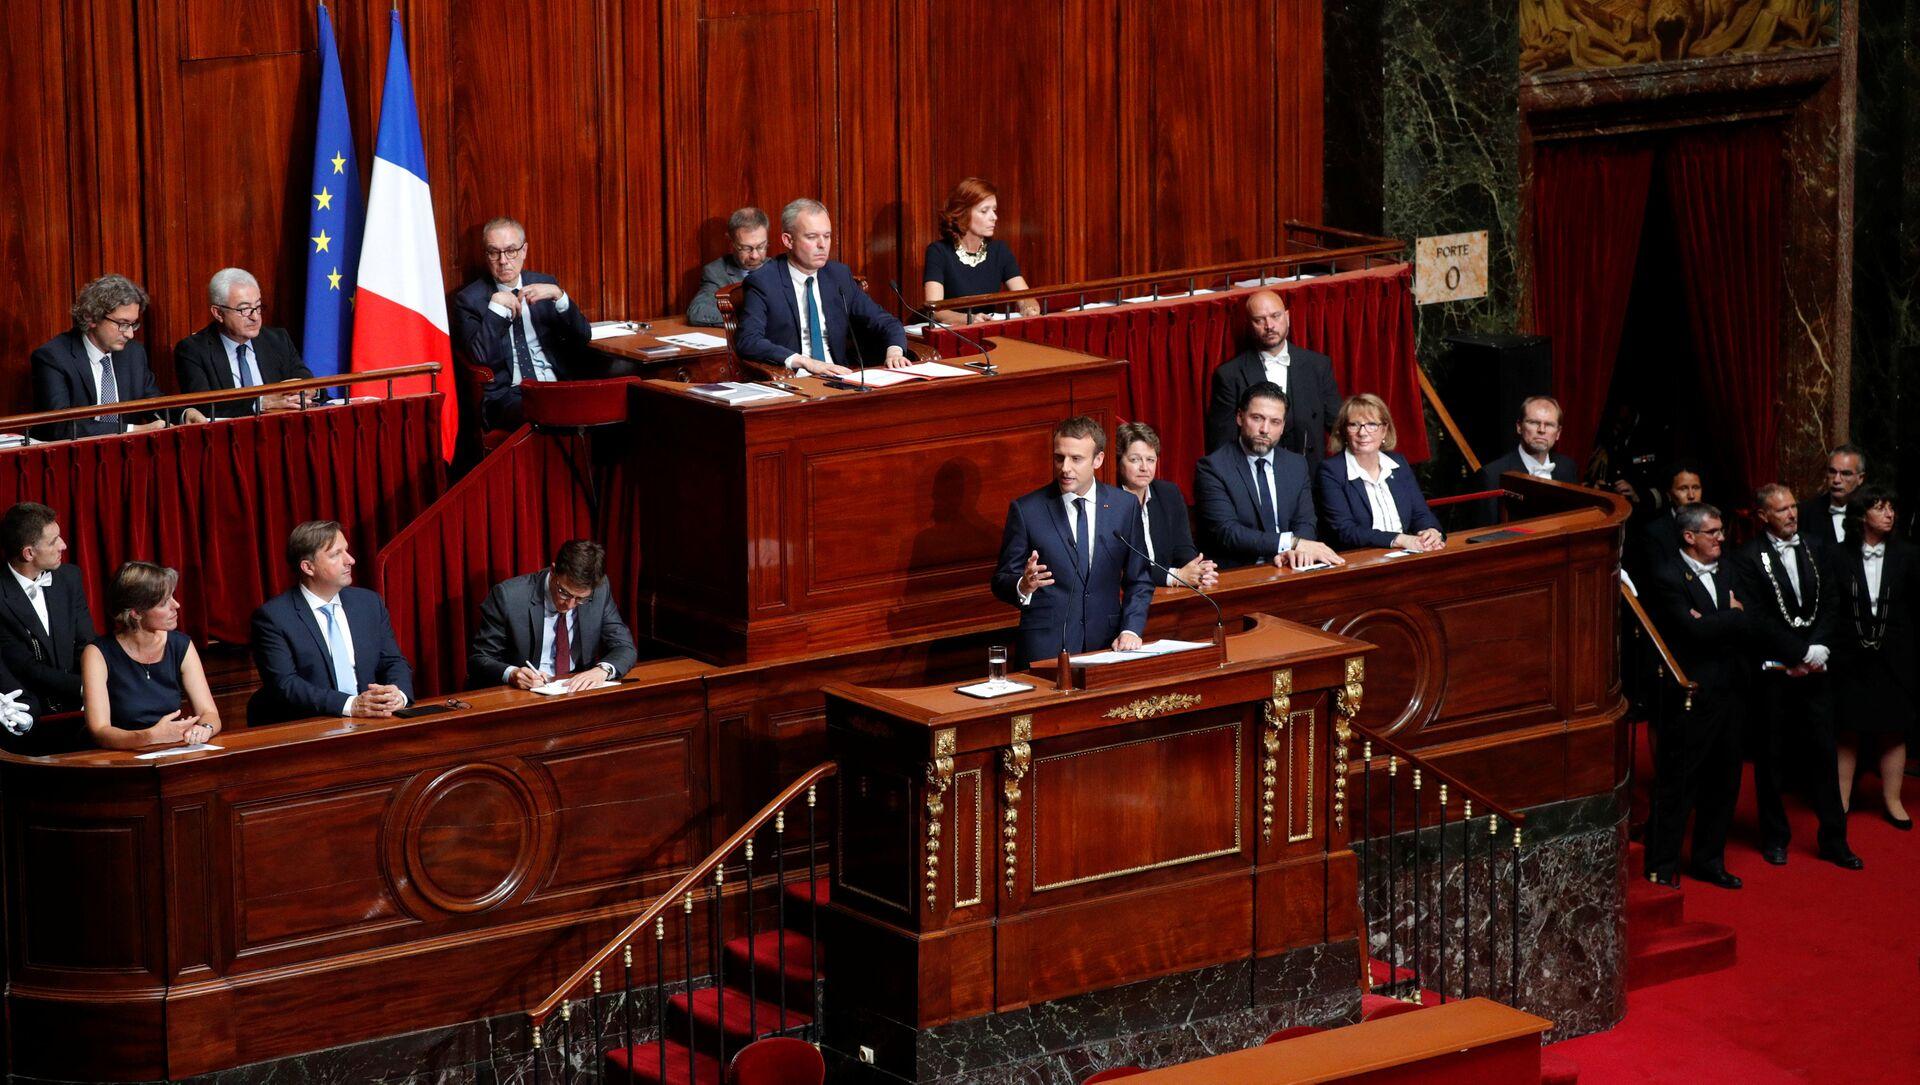 Parlamento francese - Sputnik Italia, 1920, 16.04.2021